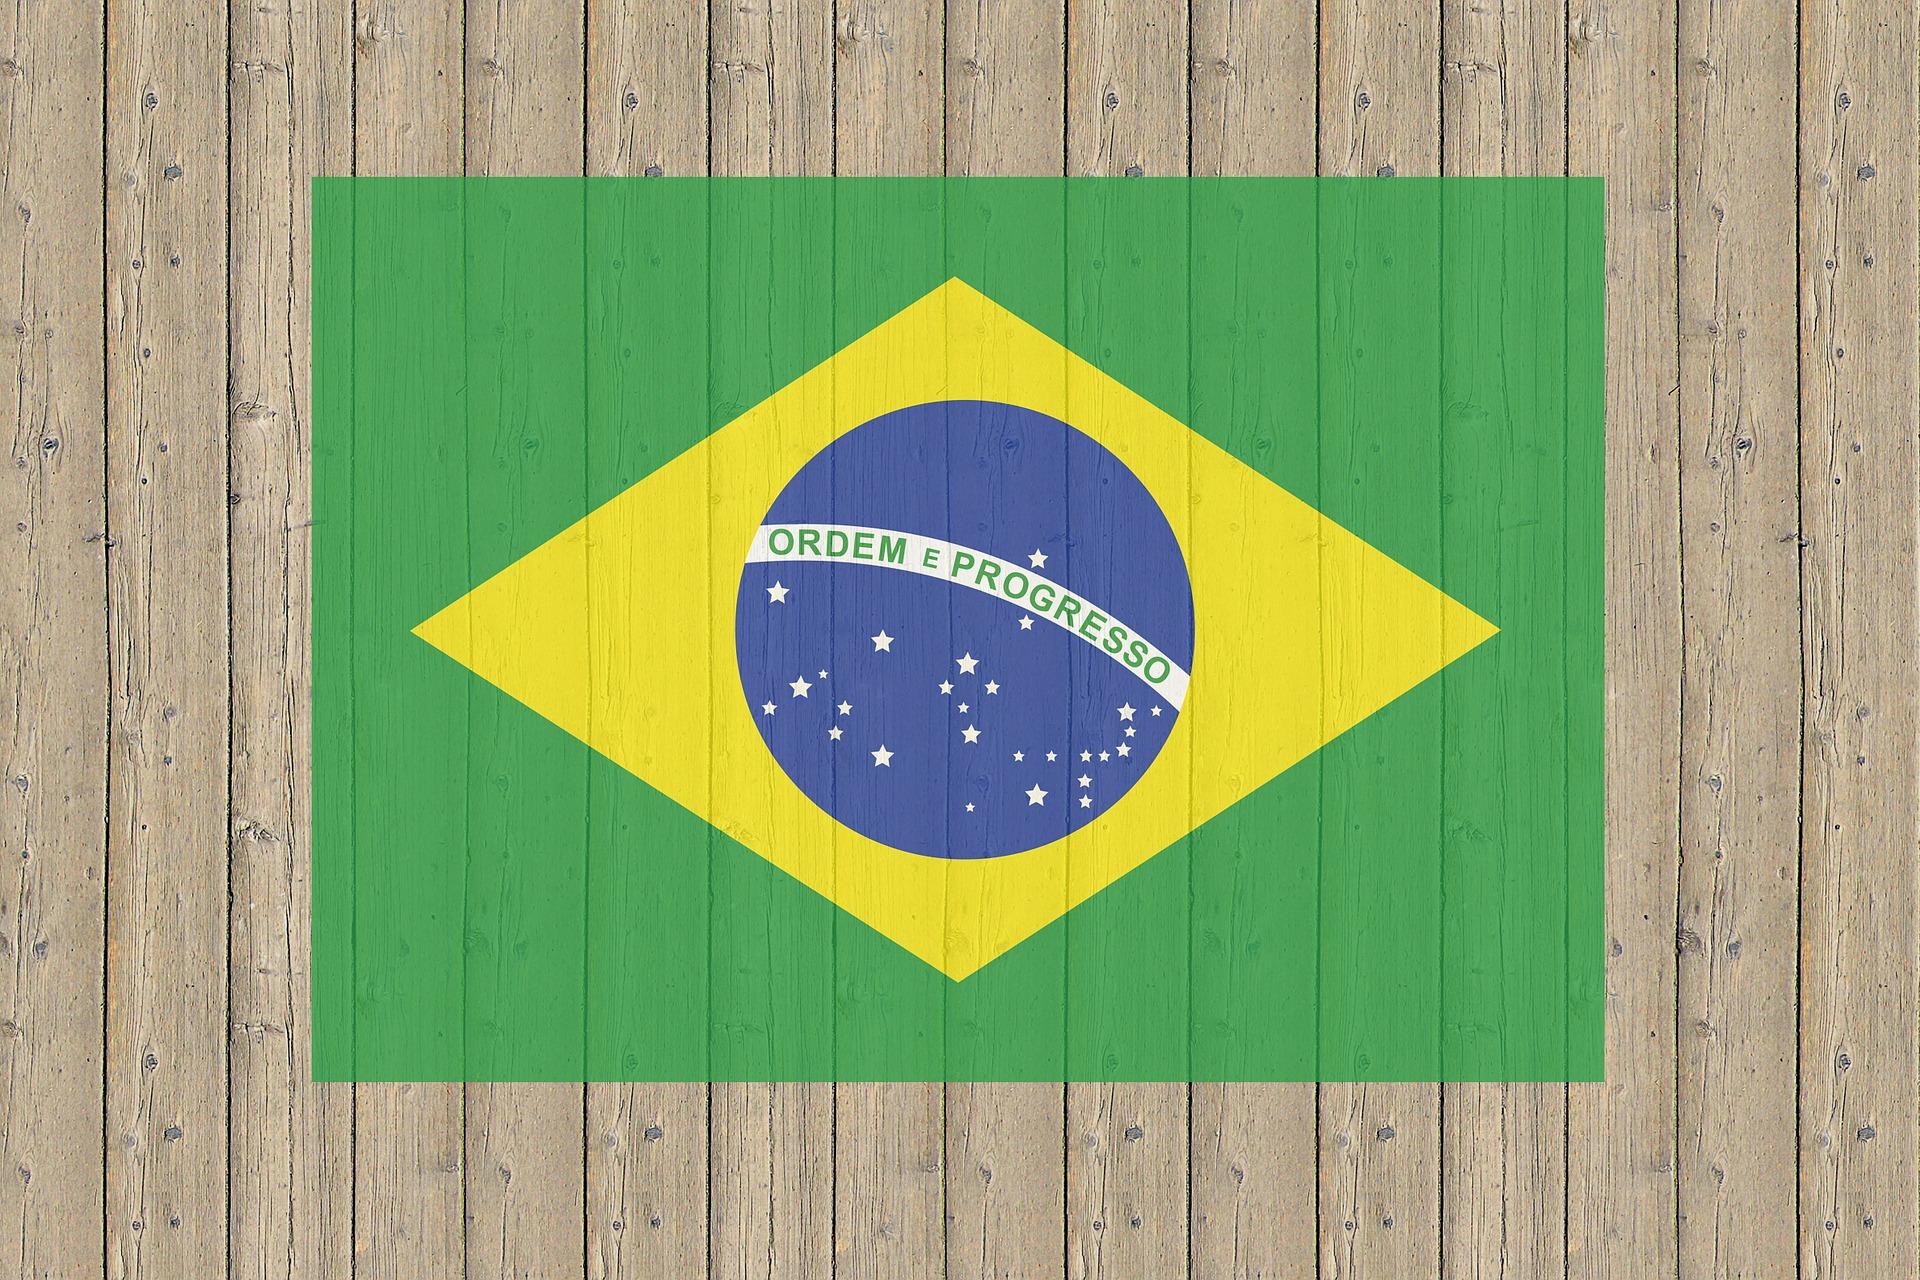 Brazilians prefer downloading online video content